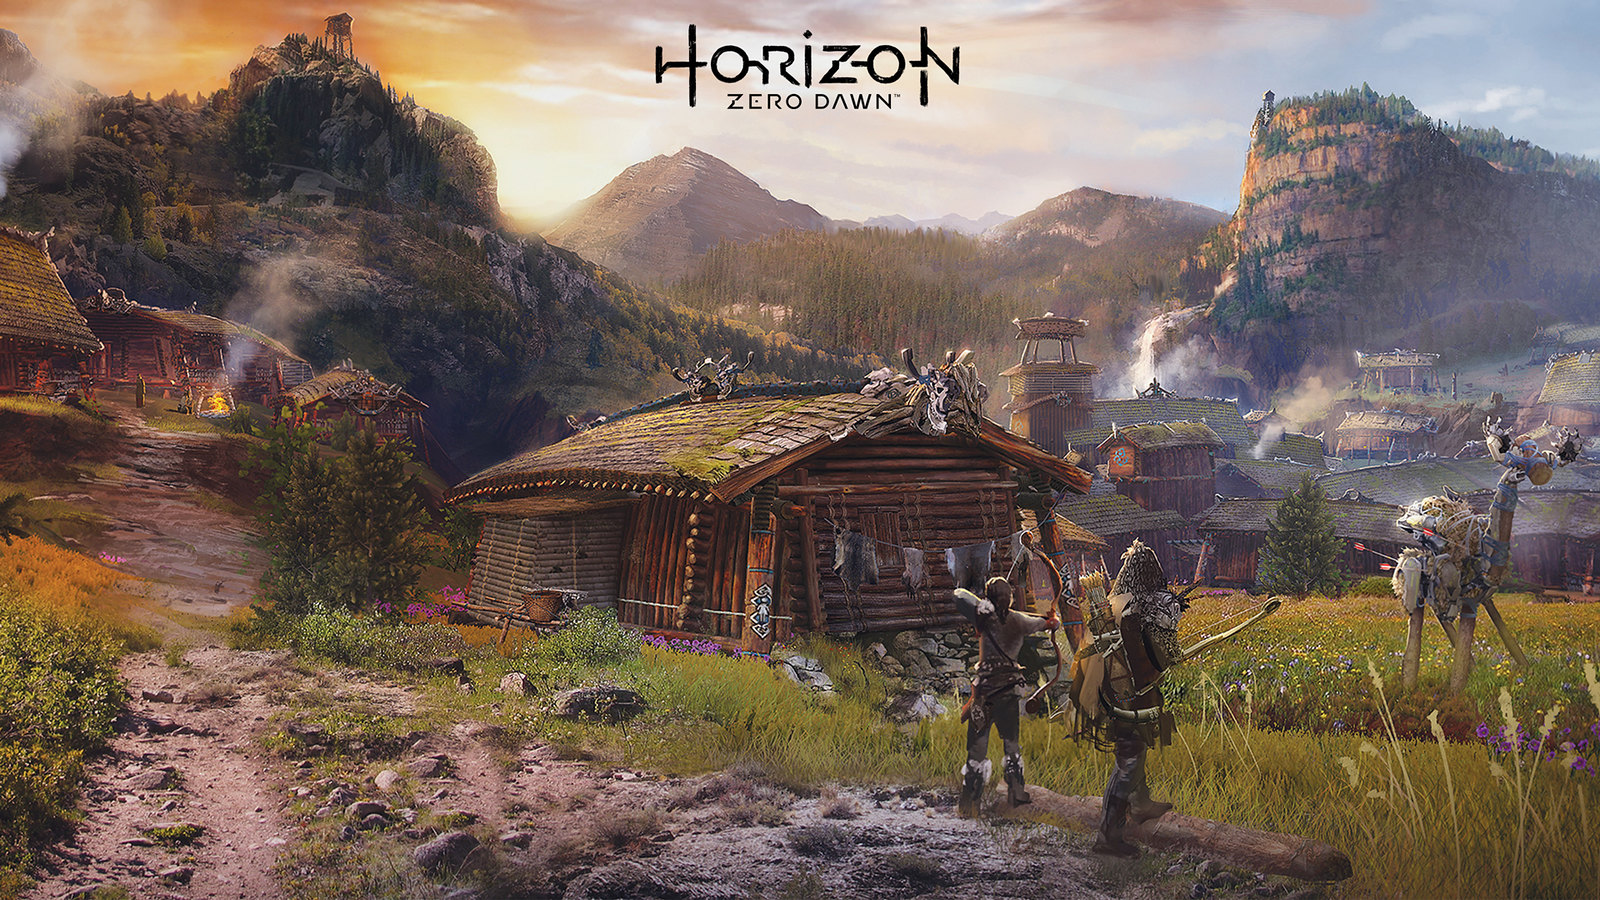 [Horizon Zero Dawn] How to Win Blazing Sun #4 (Spurflints Hunting Ground)